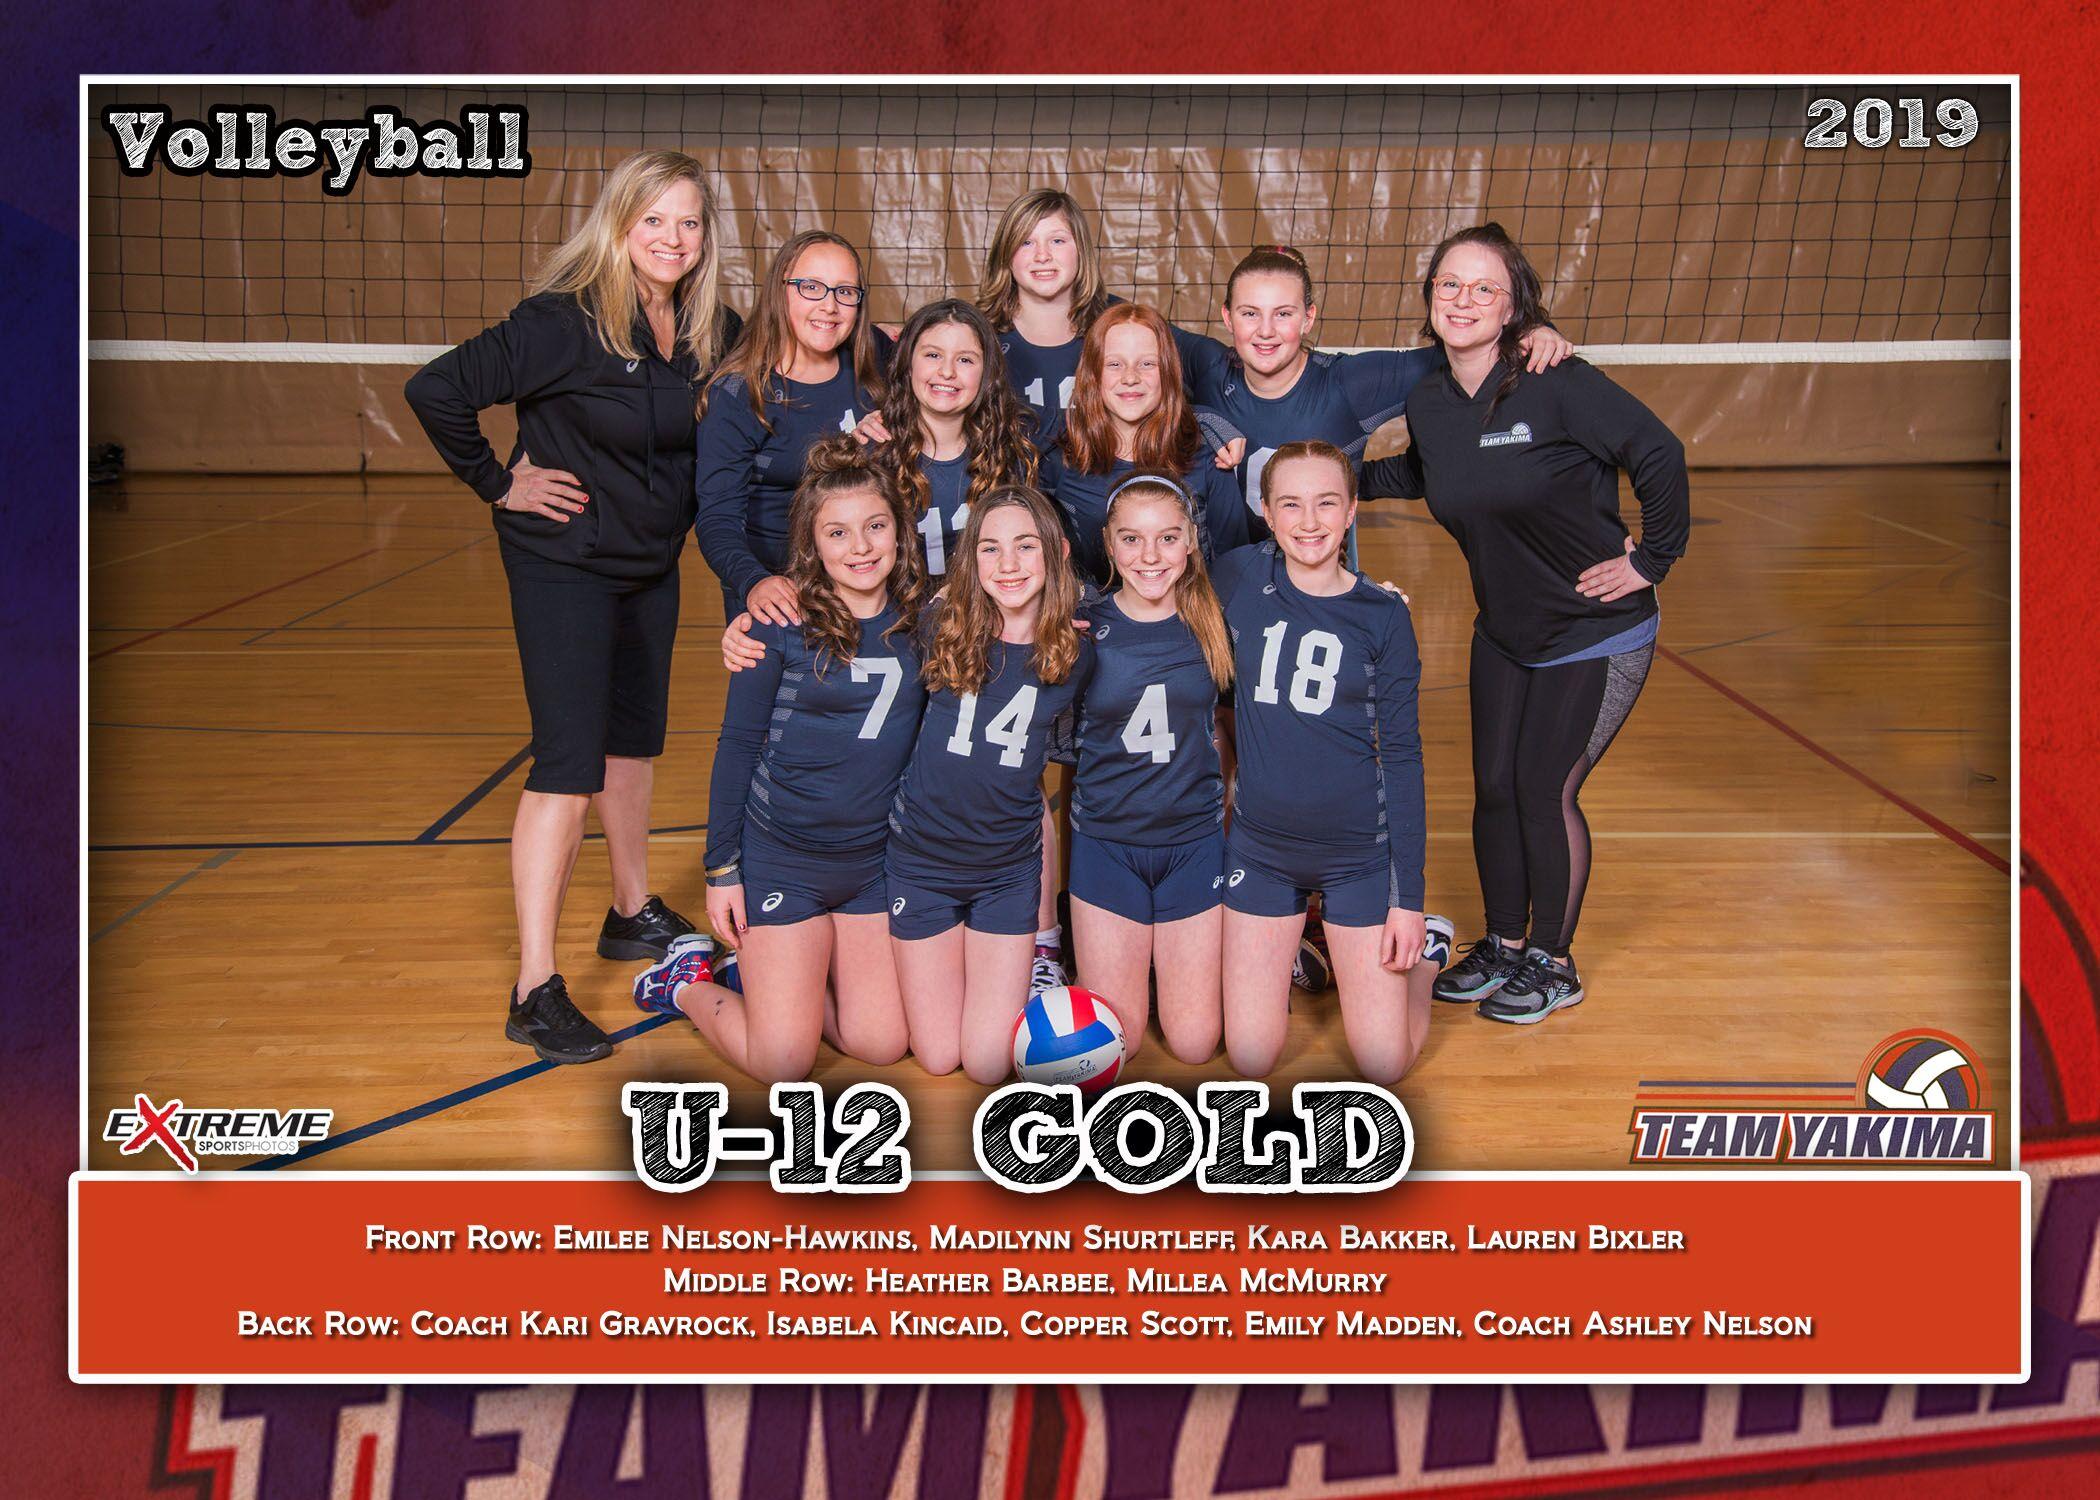 Team Yakima 12-1 Gold Elite